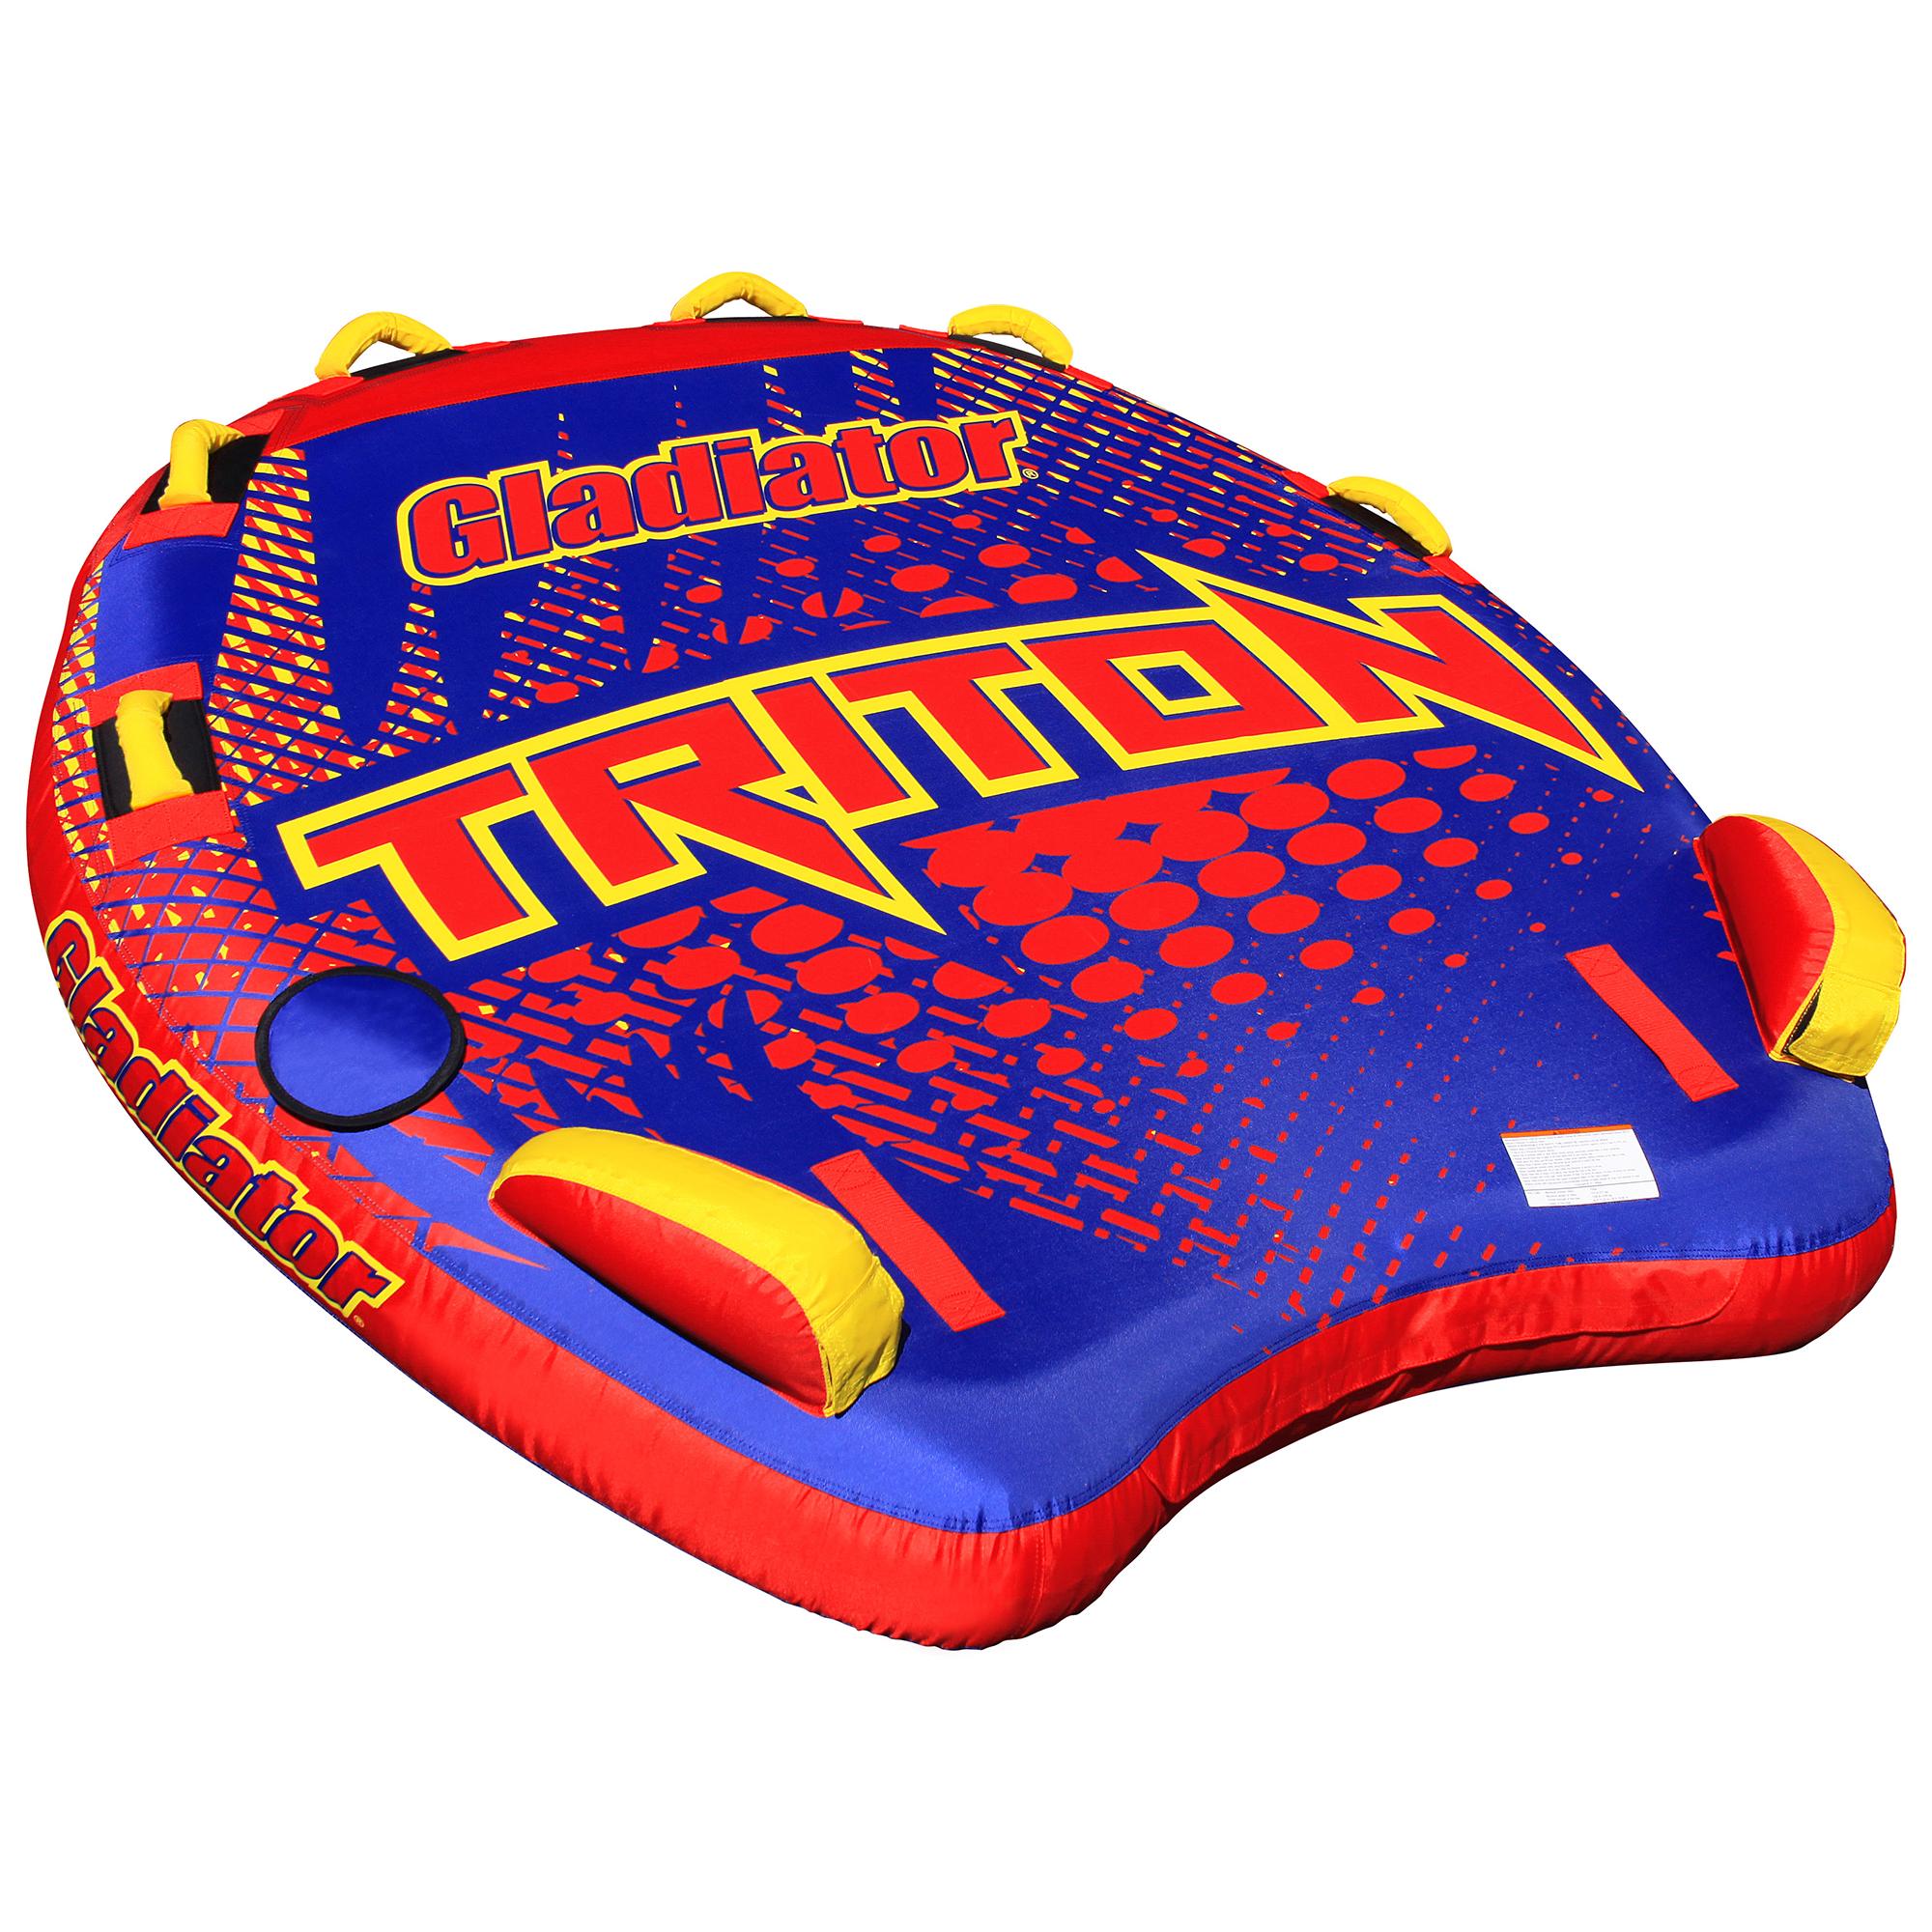 Gladiator Triton 3-Person Towable Tube Package